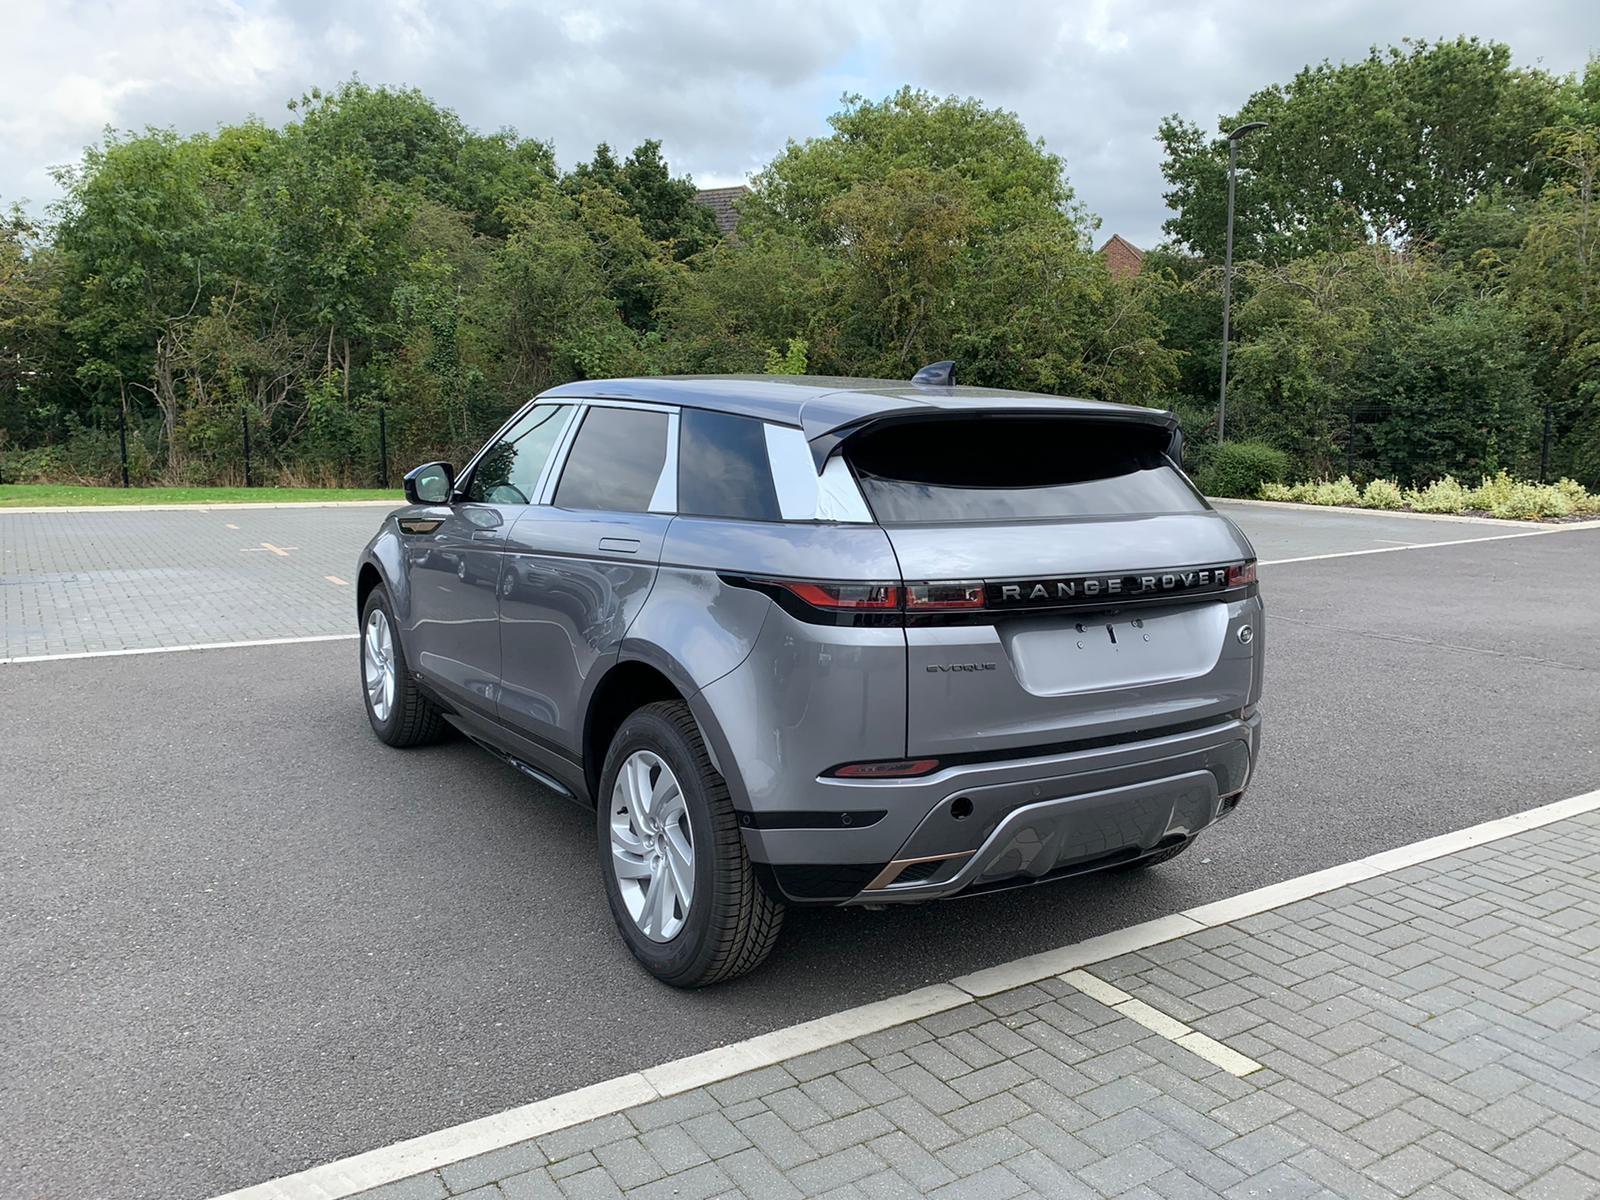 Land Rover New Range Rover Evoque AWD Auto R-Dynamic S image 4